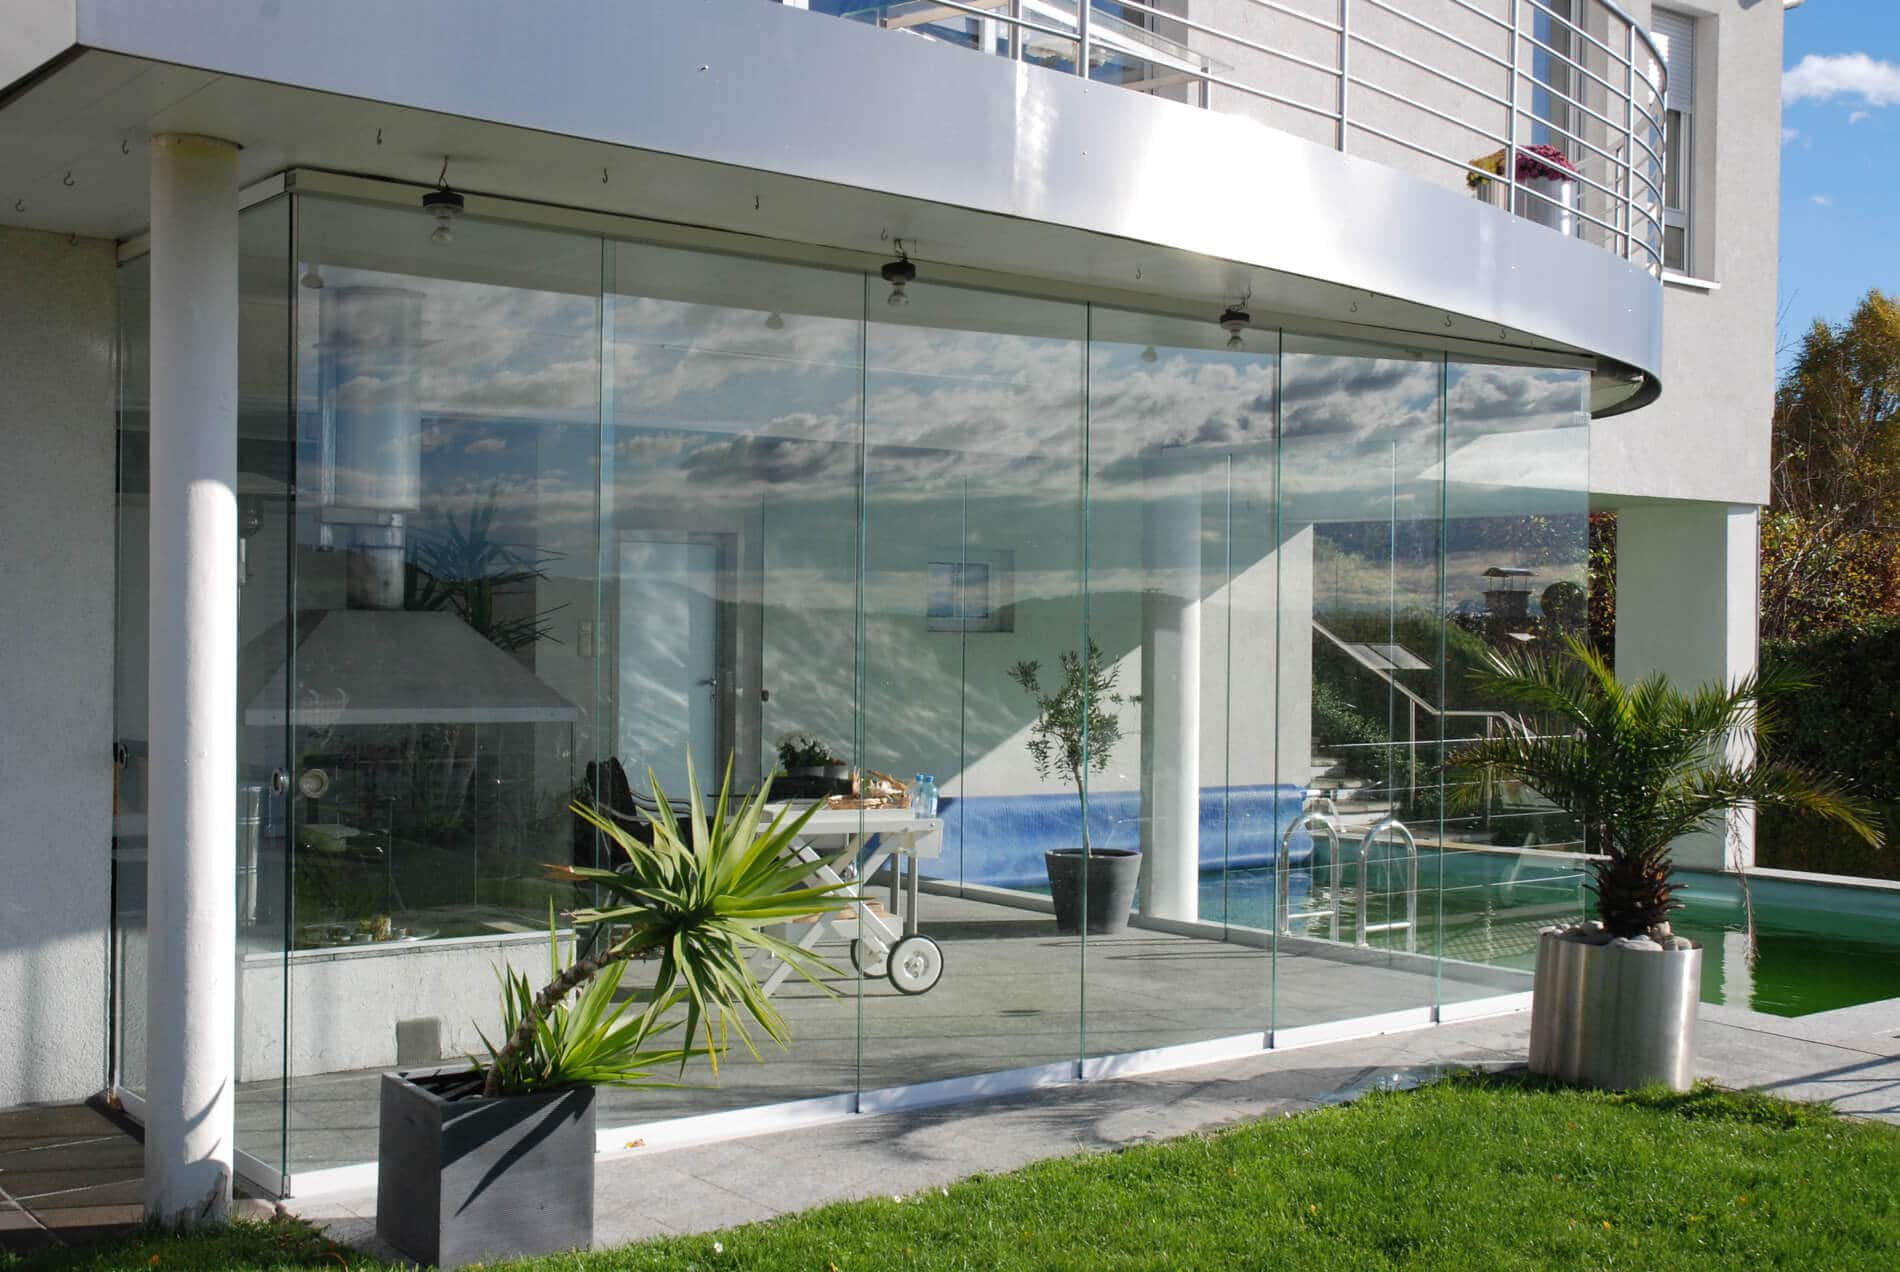 terrasse mit glasschiebet r schlie en wintergarten schmidinger. Black Bedroom Furniture Sets. Home Design Ideas